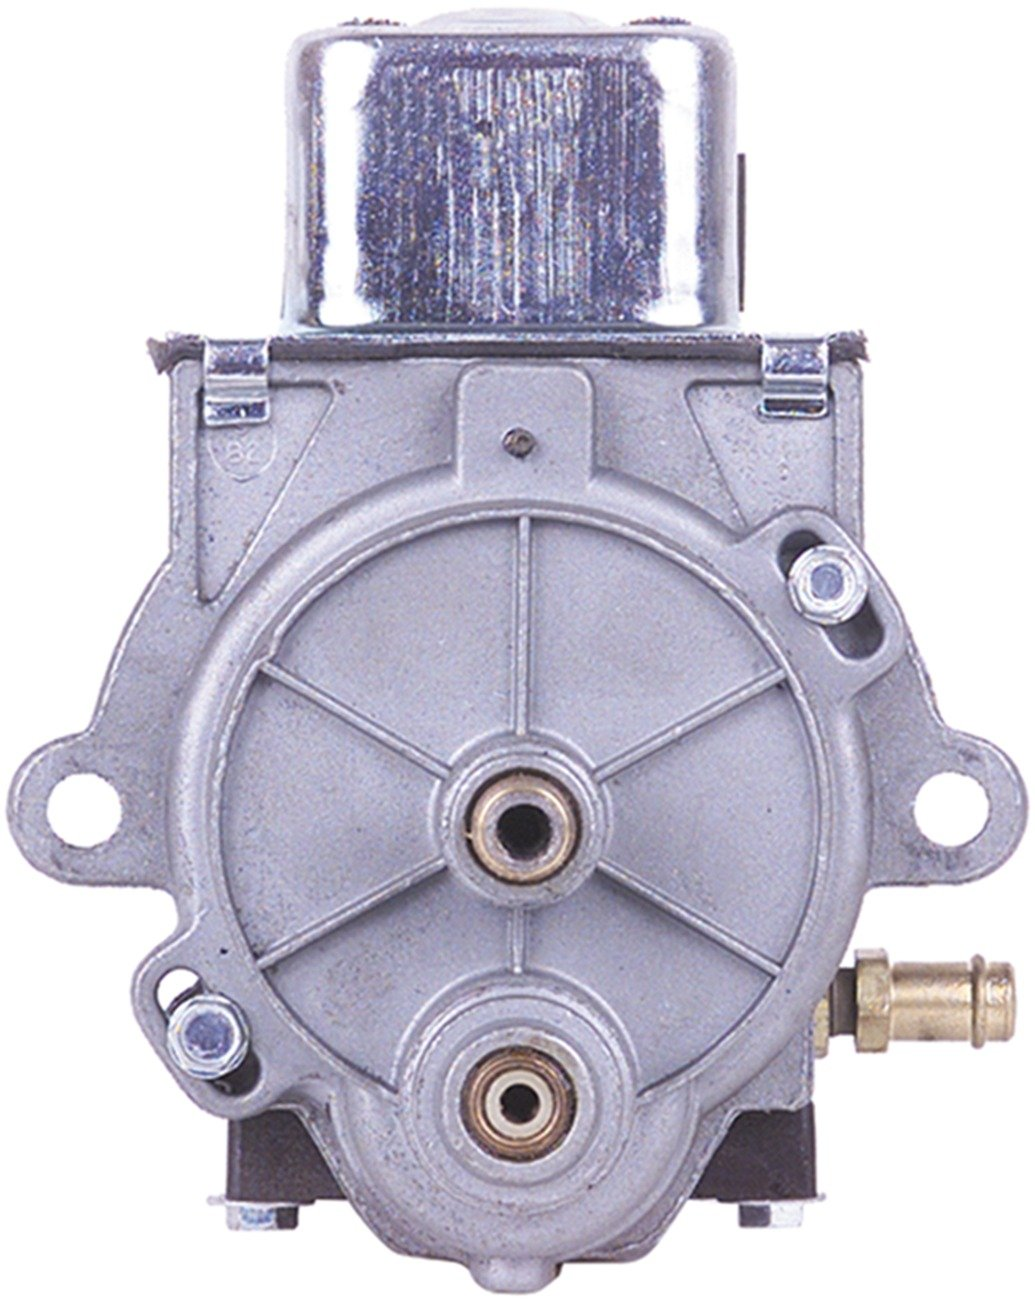 Cardone 36-105 Remanufactured Cruise Control Transducer